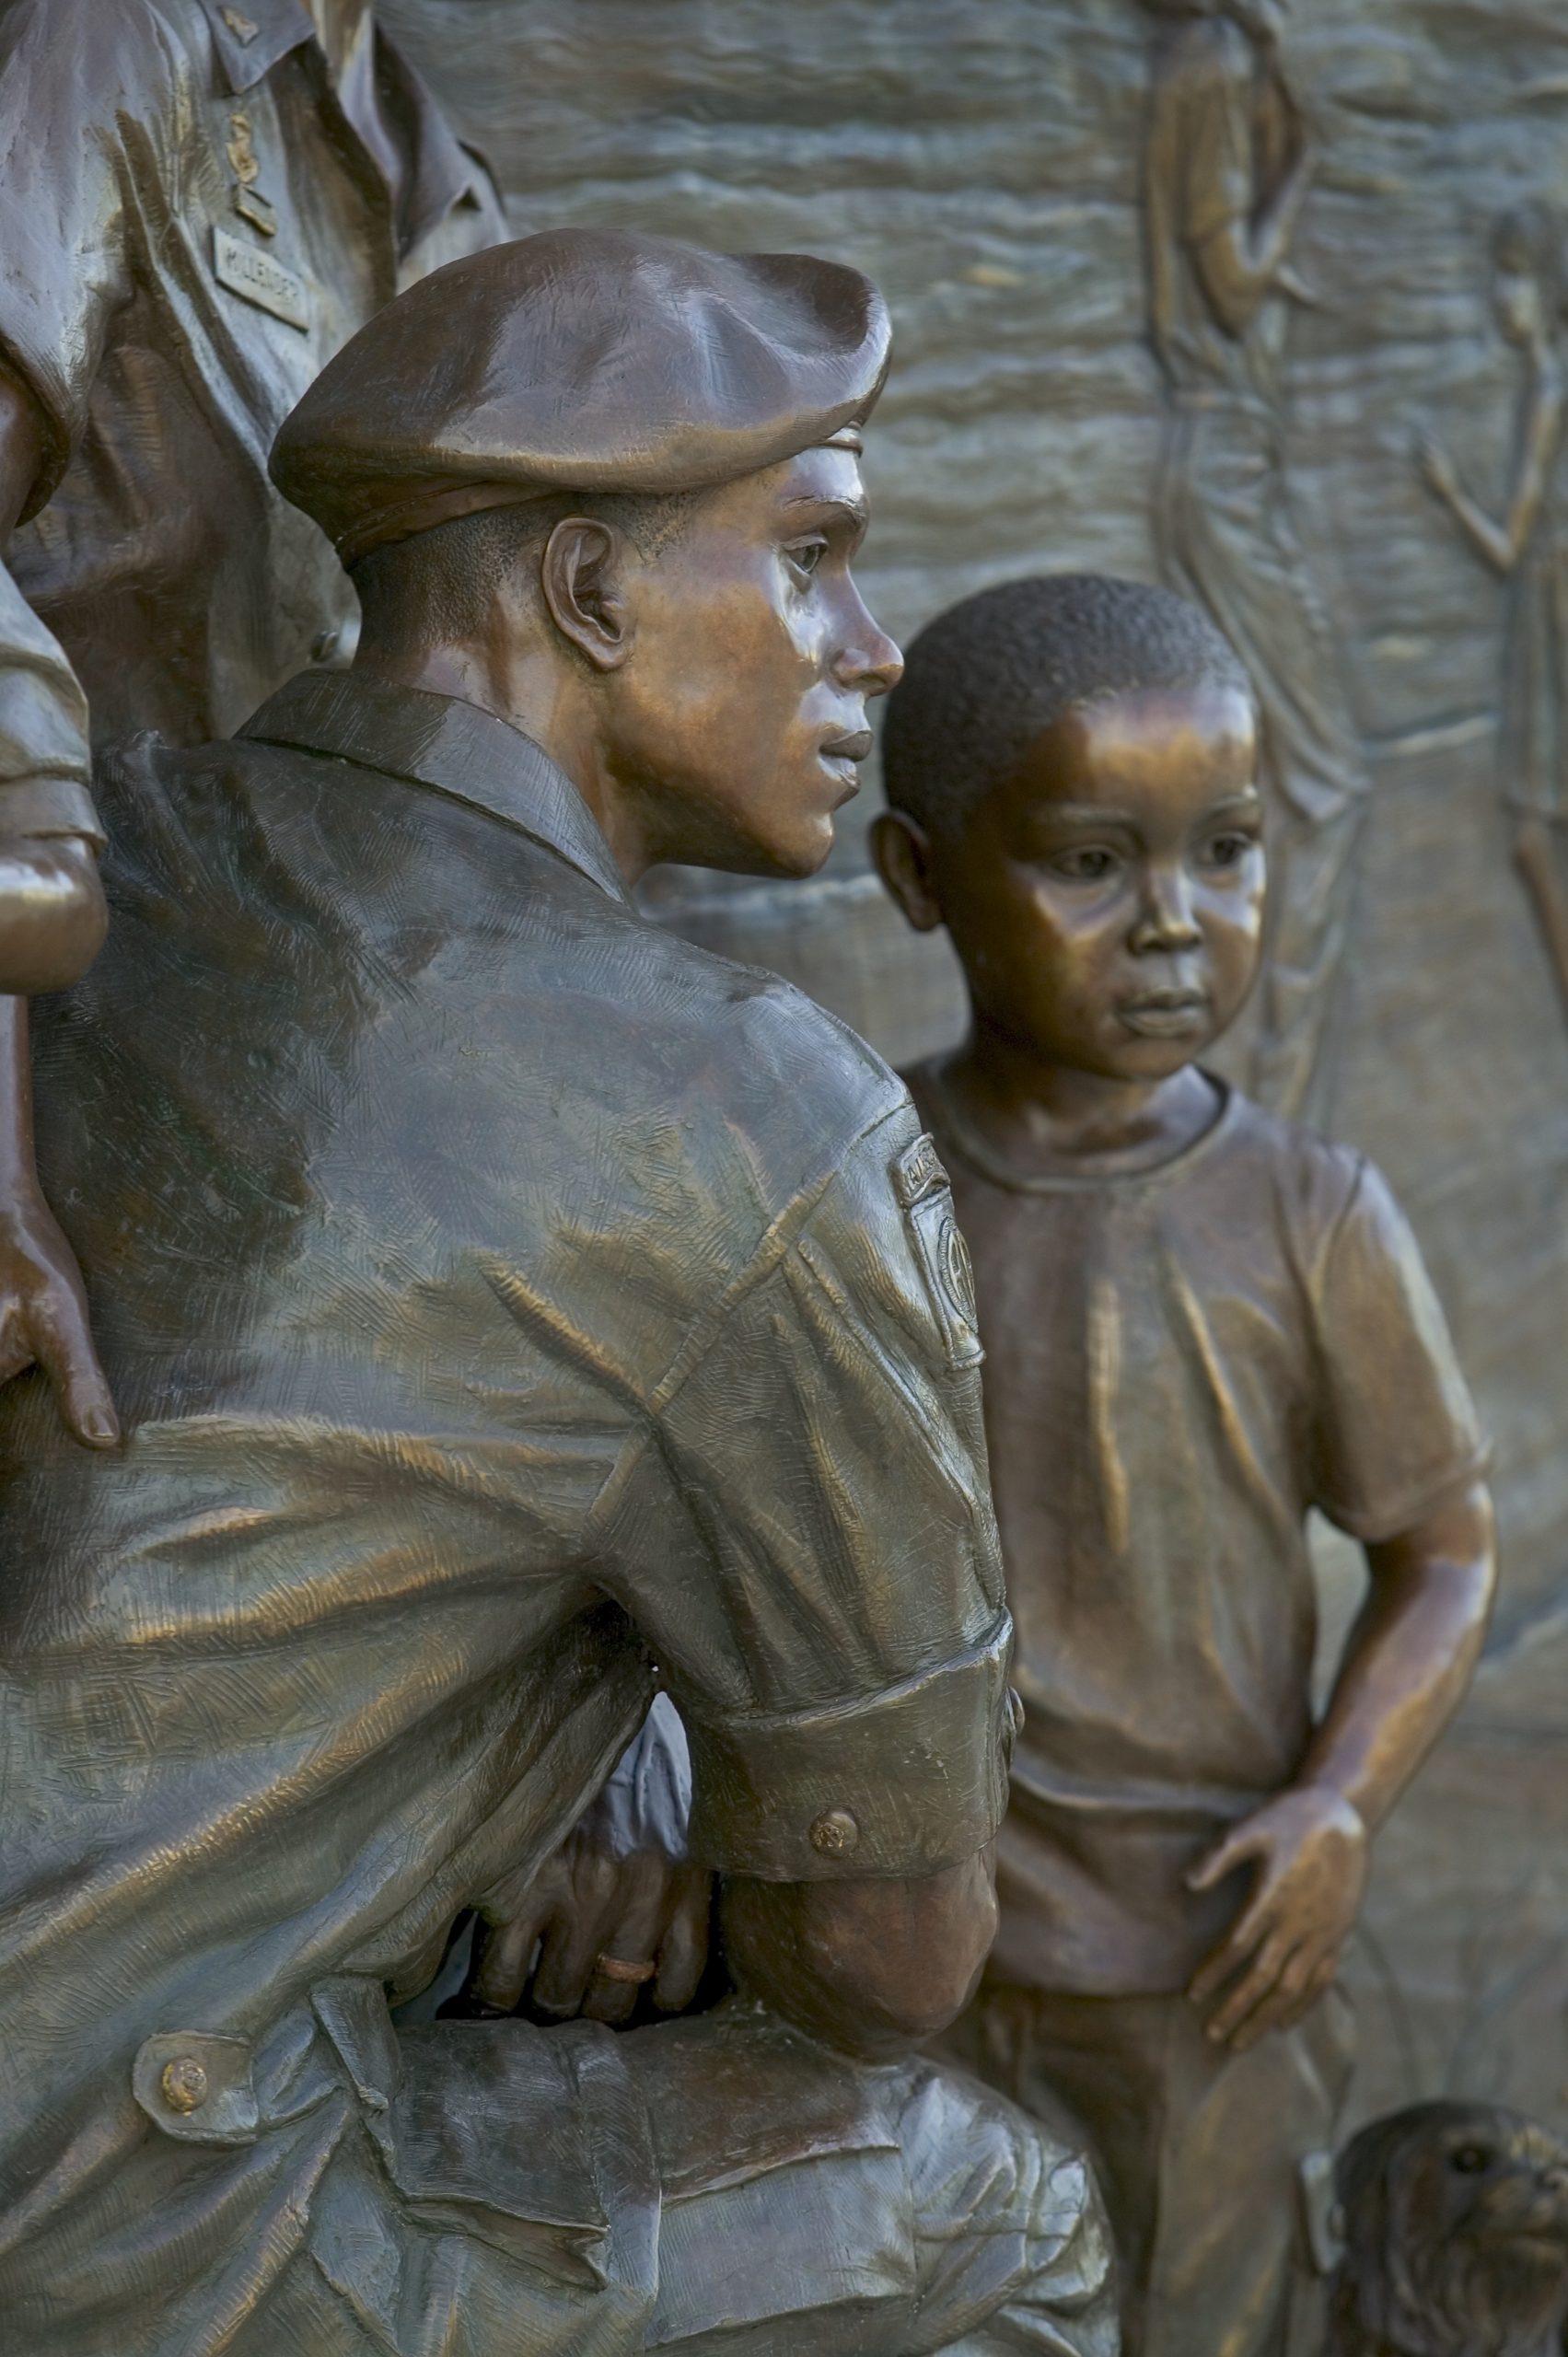 Soldier Field Veterans Memorial